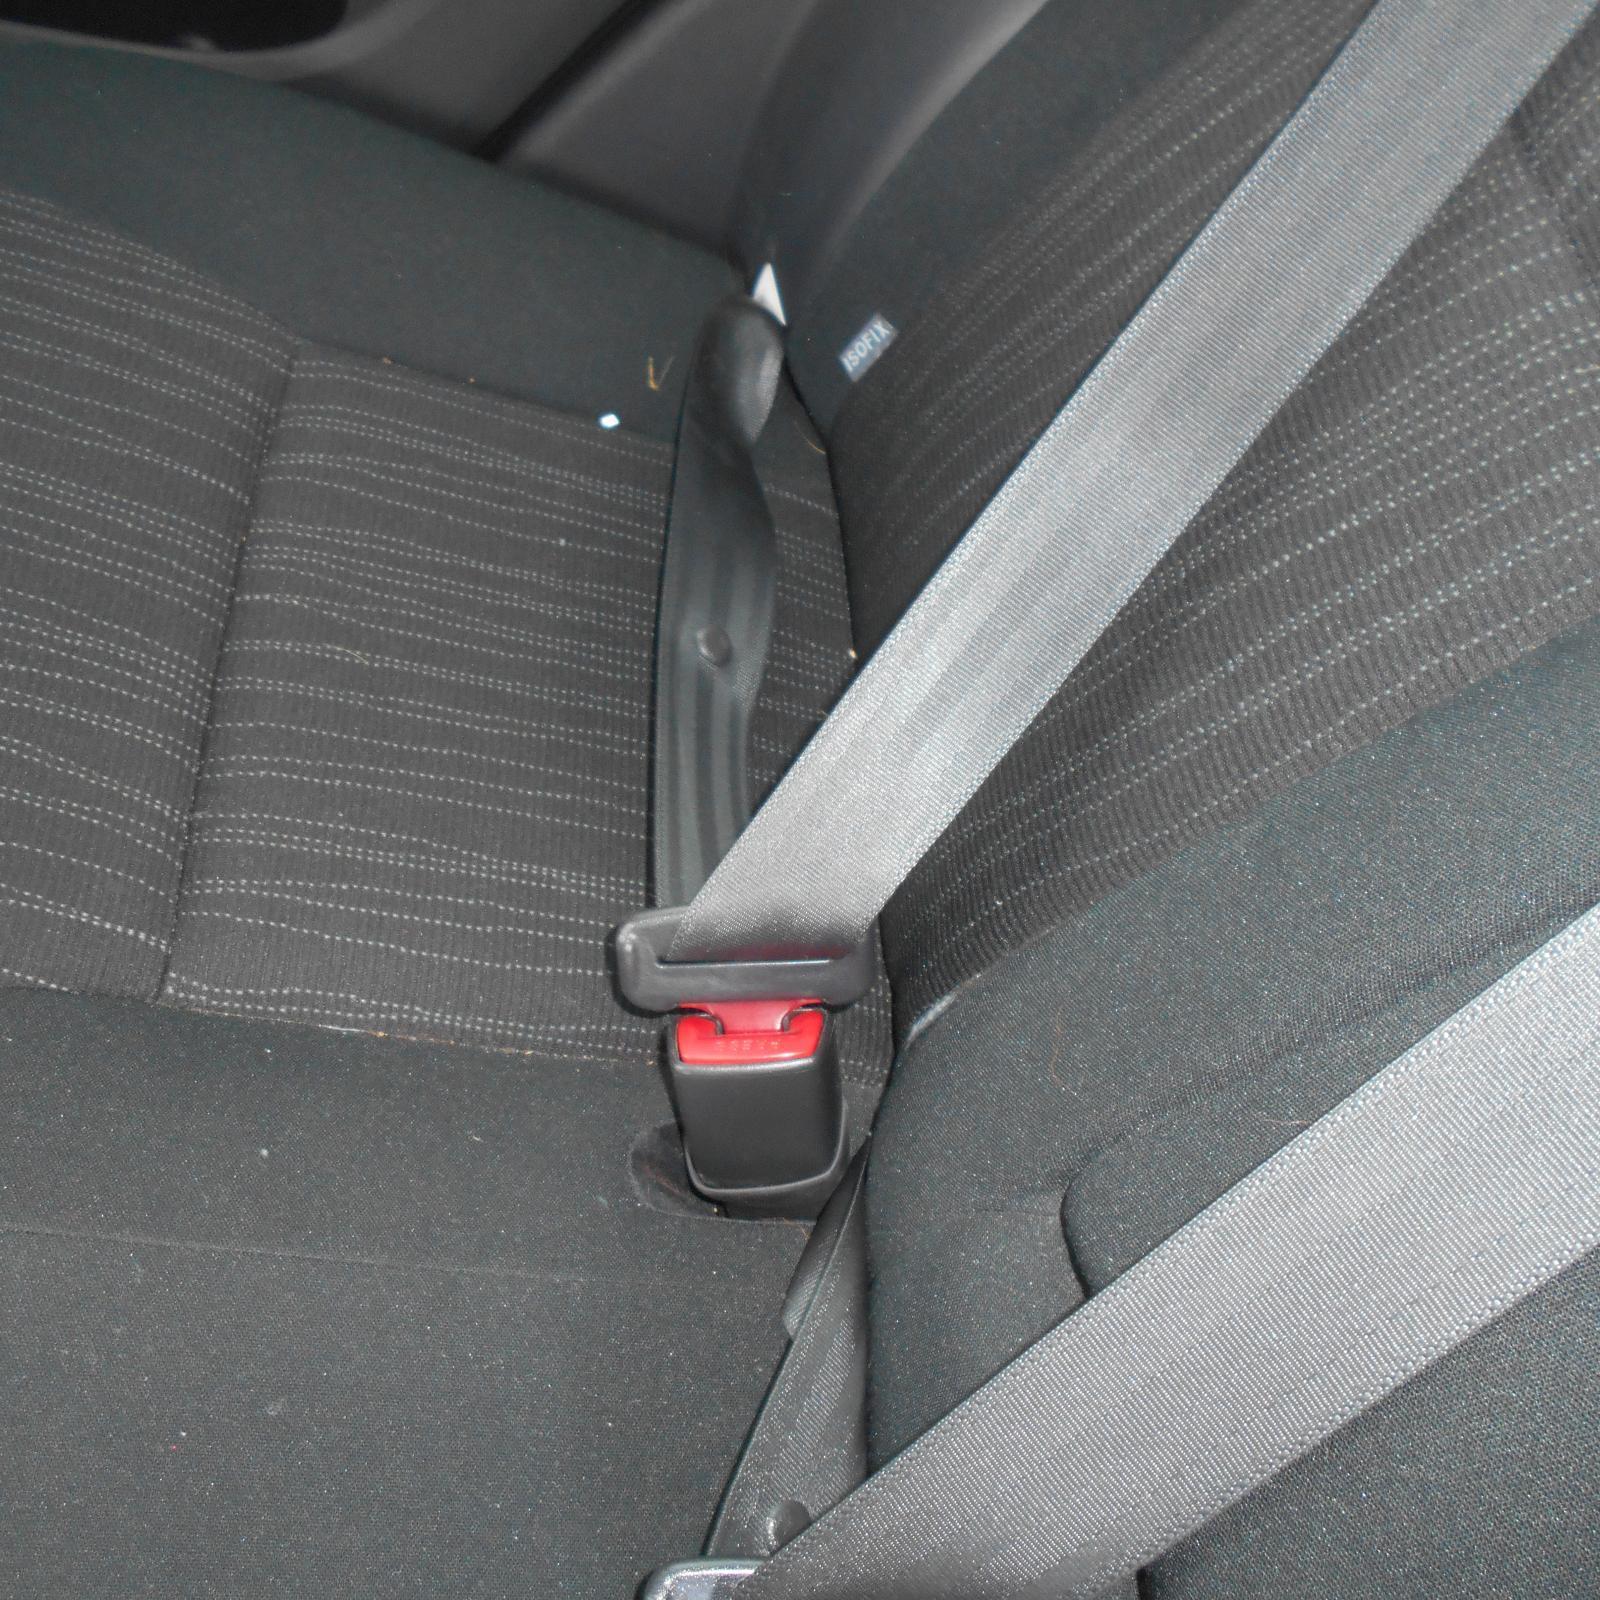 TOYOTA COROLLA, Seatbelt/Stalk, RH REAR, SEAT BELT STALK ONLY, ZRE152R, HATCH, 03/07-09/12